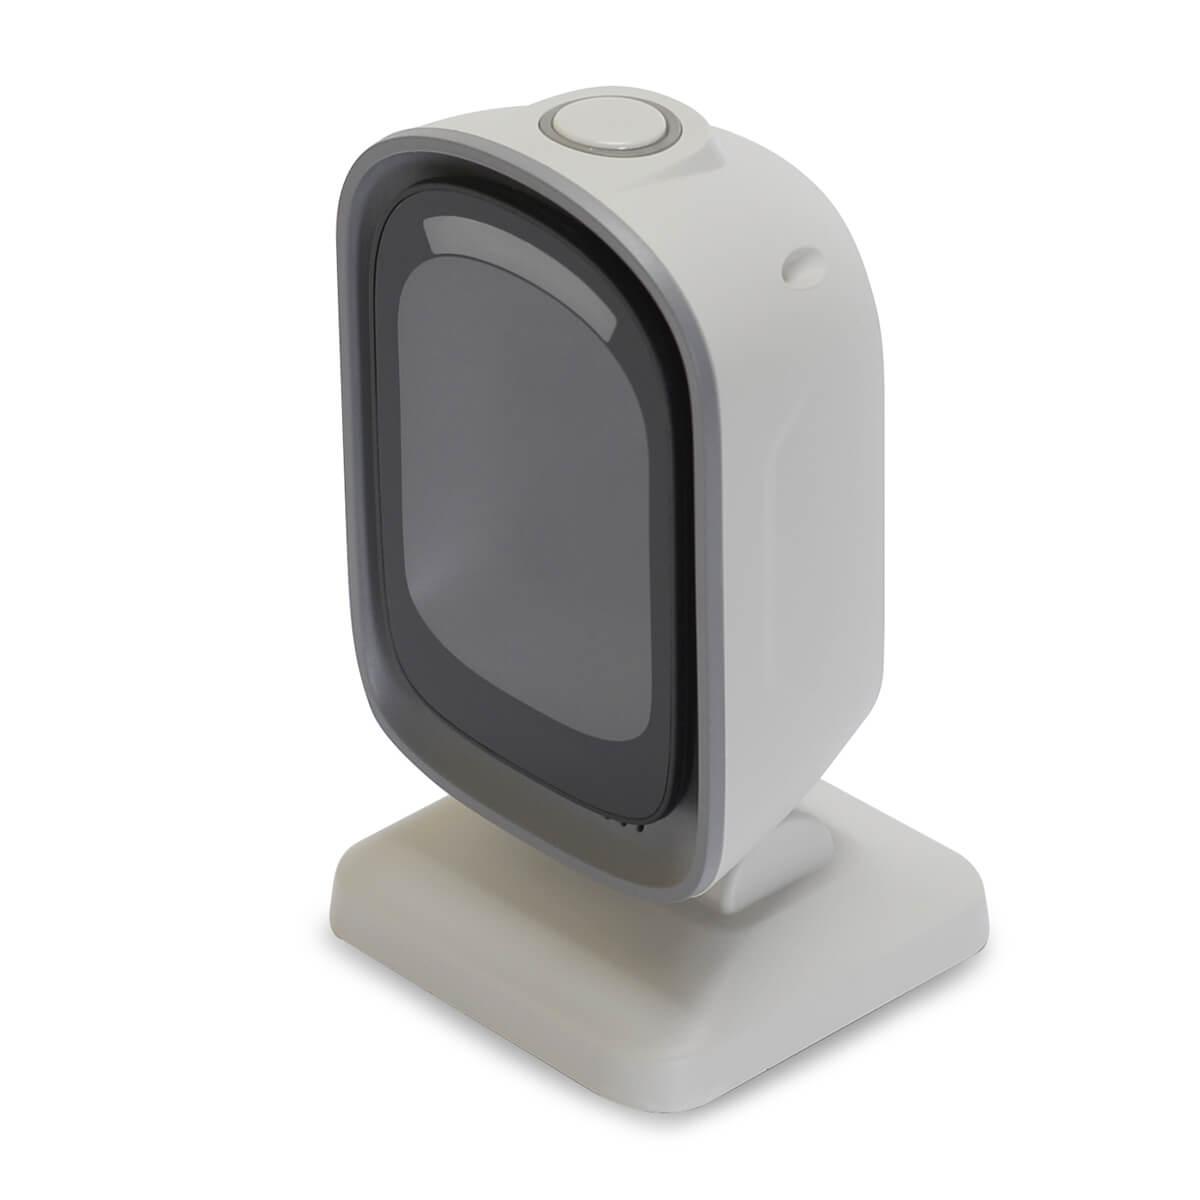 Стационарный  сканер штрих-кода Mercury 8500 P2D Mirror White